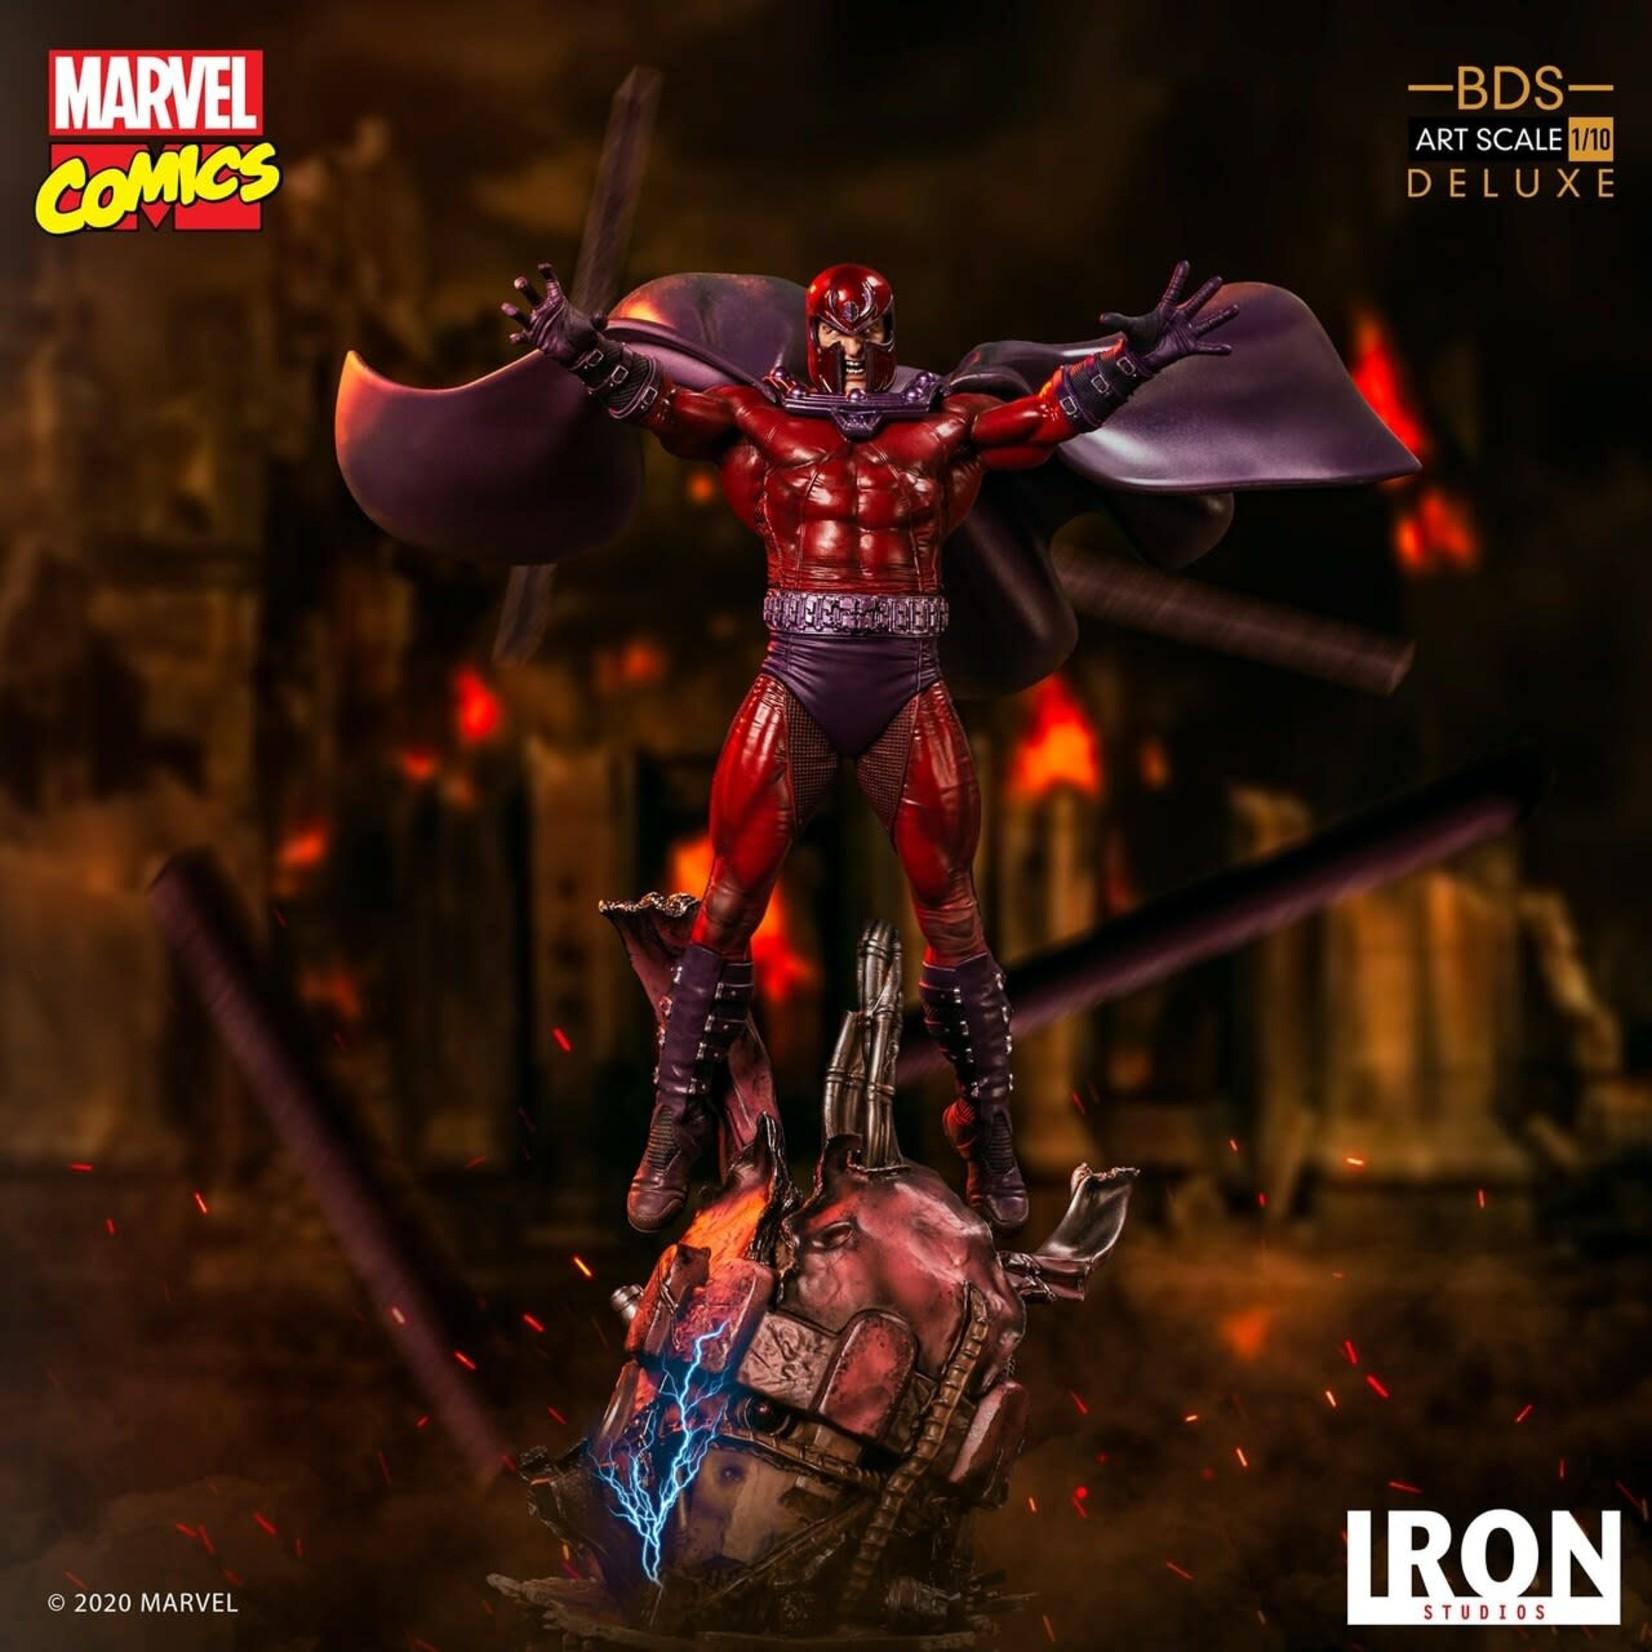 Iron Studios Iron Studios Magneto Deluxe BDS Art Scale 1/10